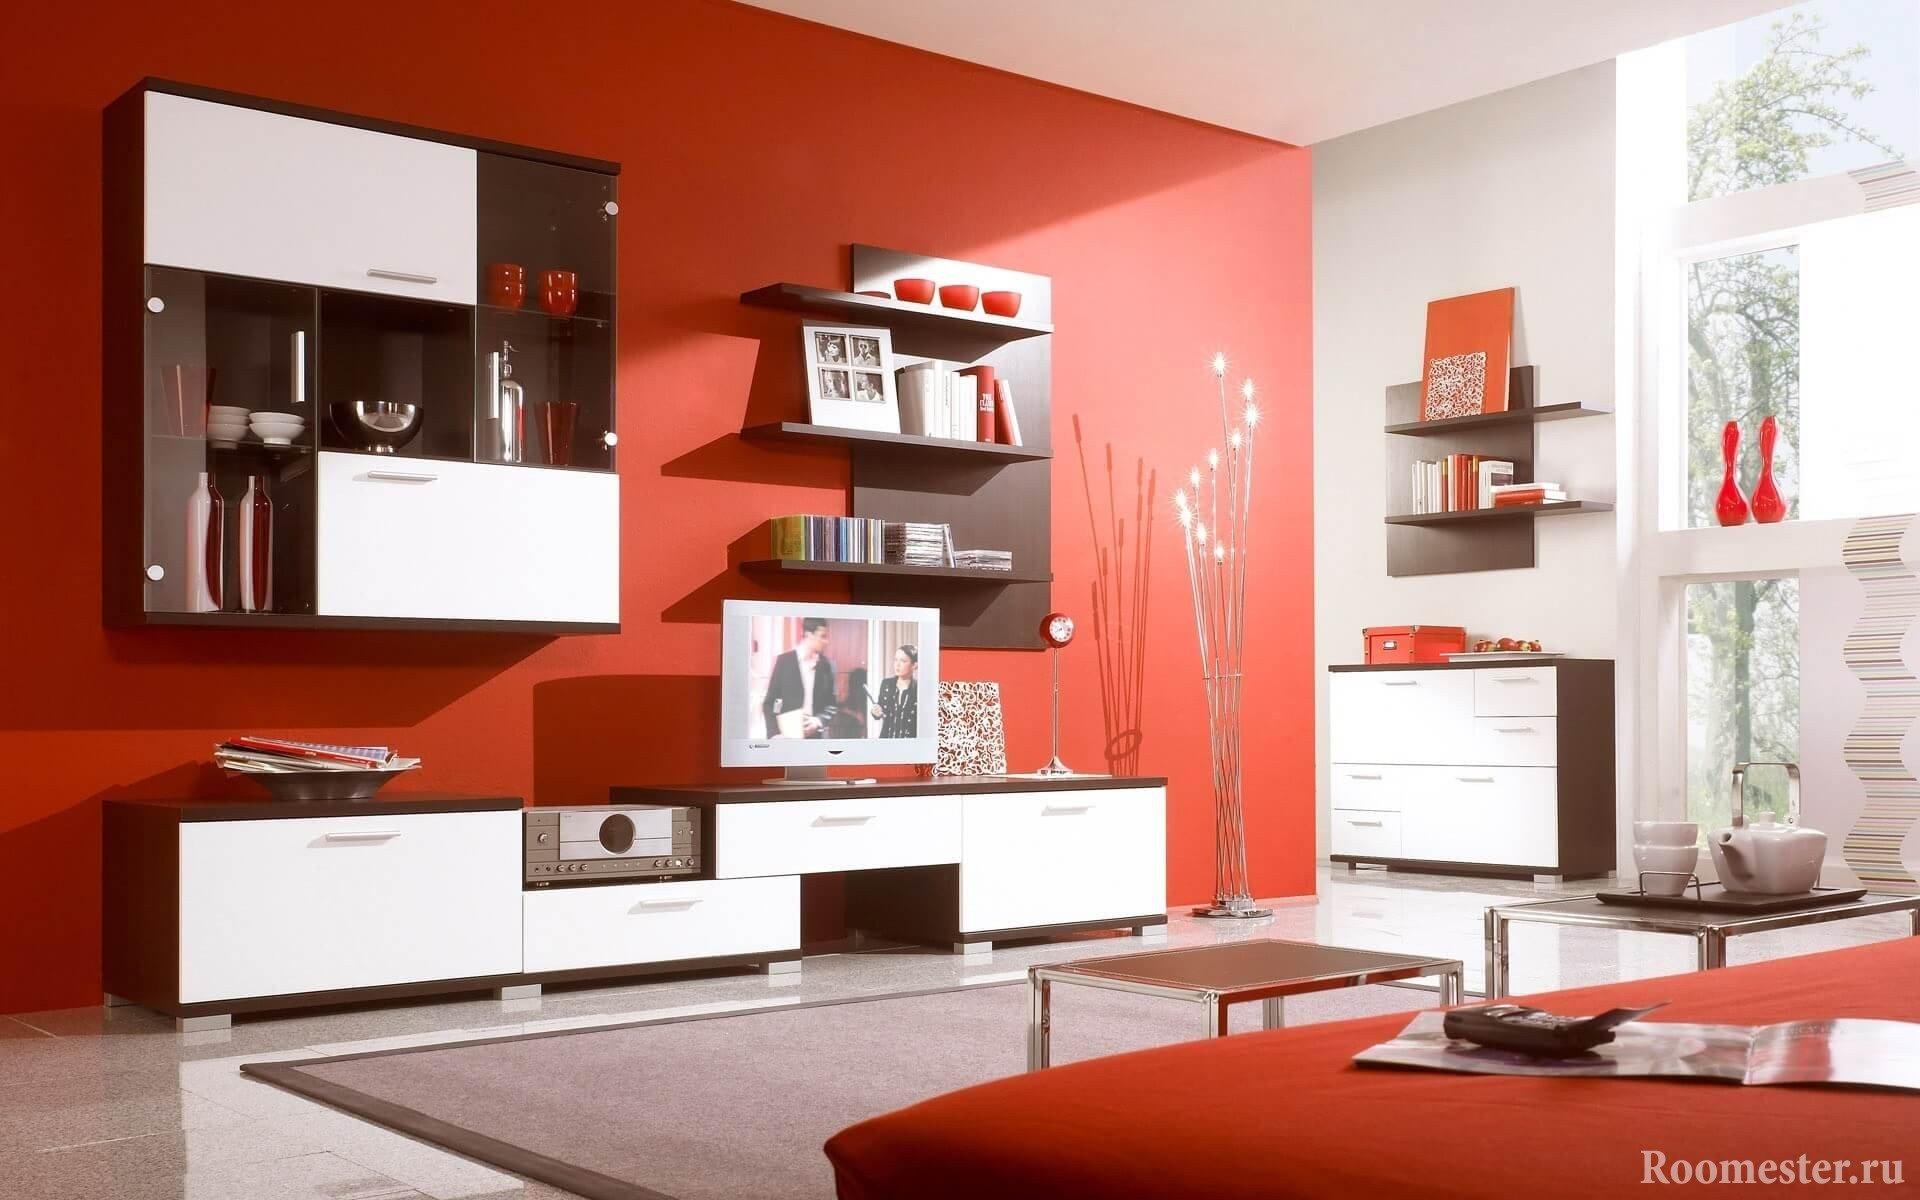 Бело-красный интерьер гостиной комнаты